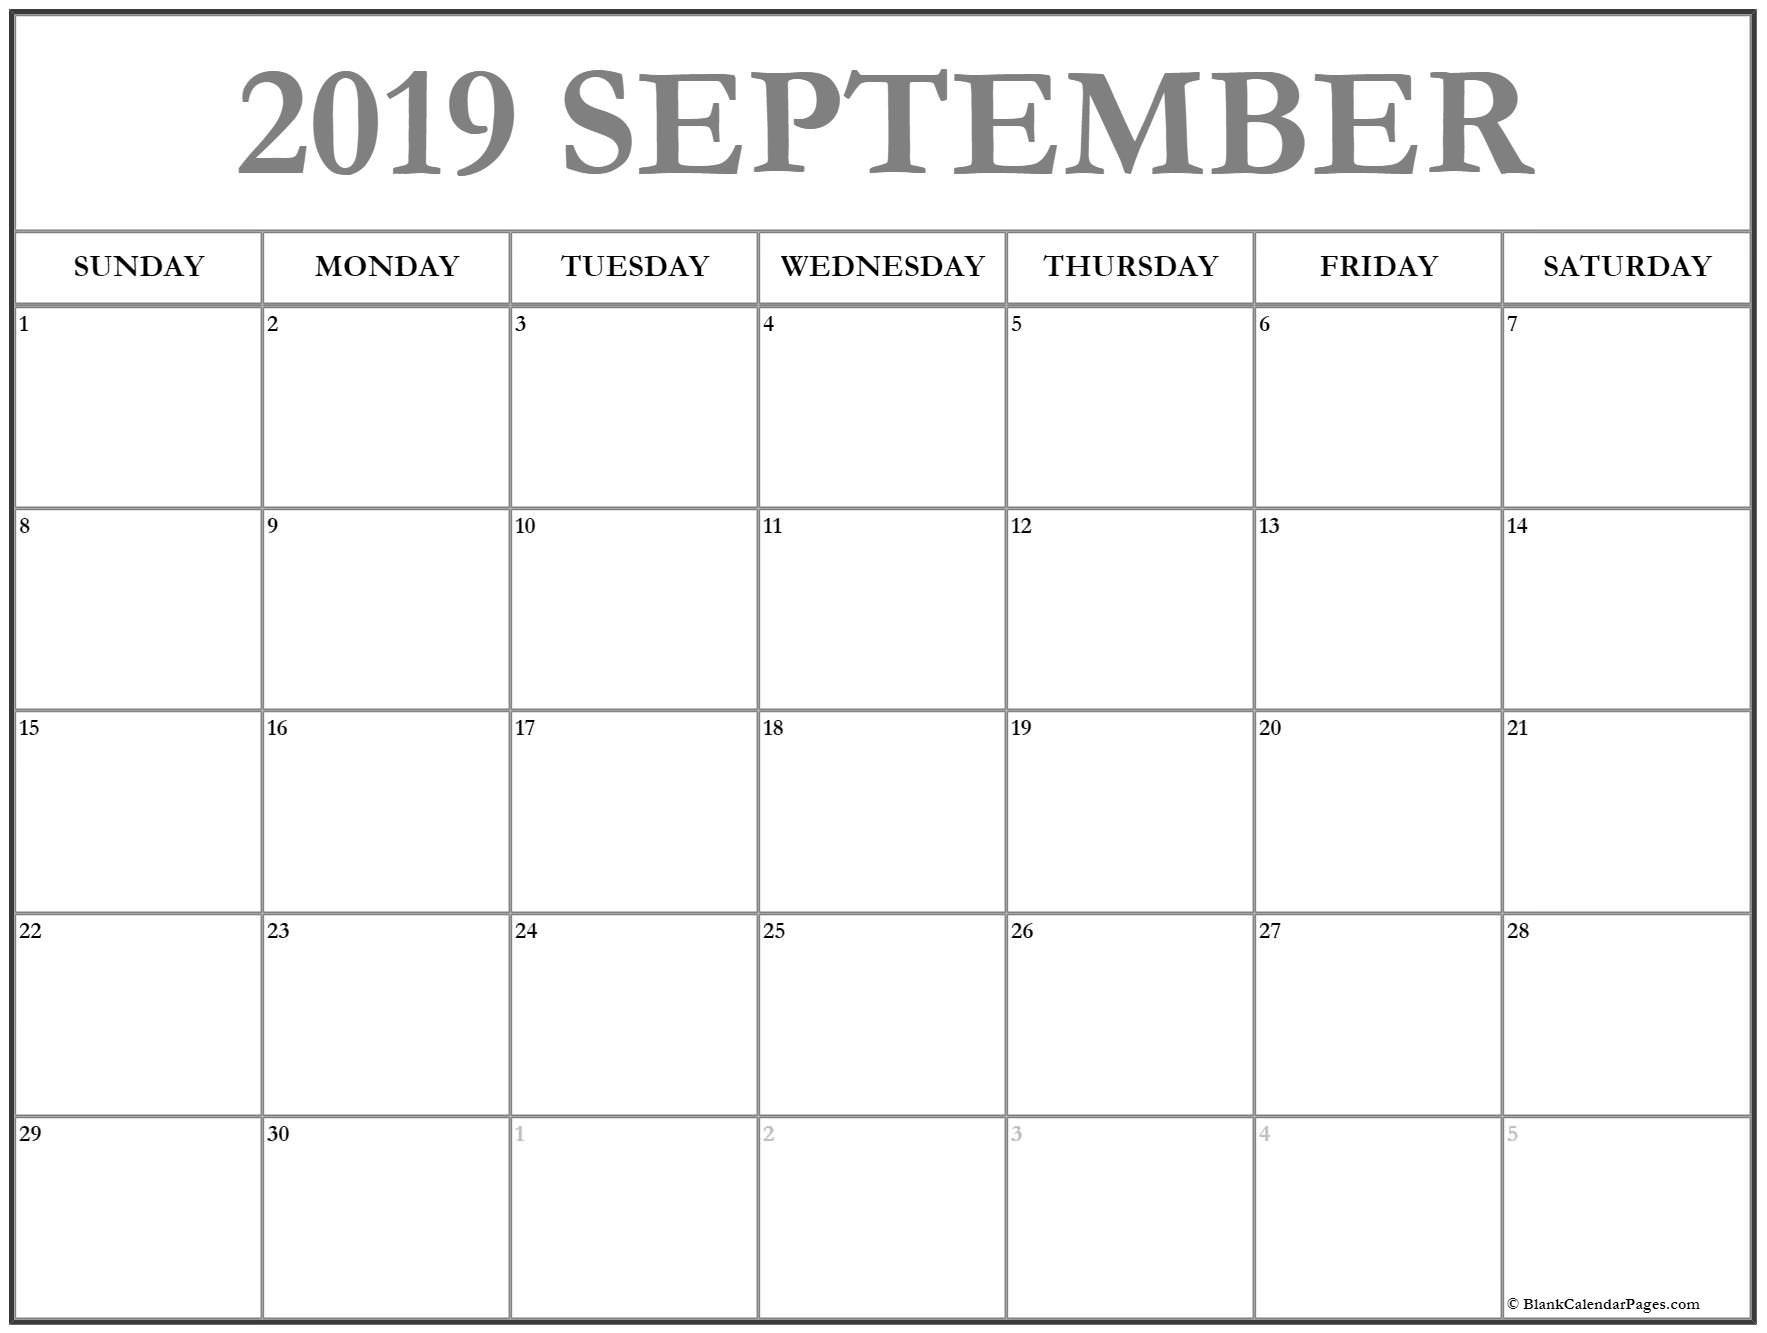 September 2019 Calendar | Free Printable Monthly Calendars Mon Fri Monthly Calendar Template